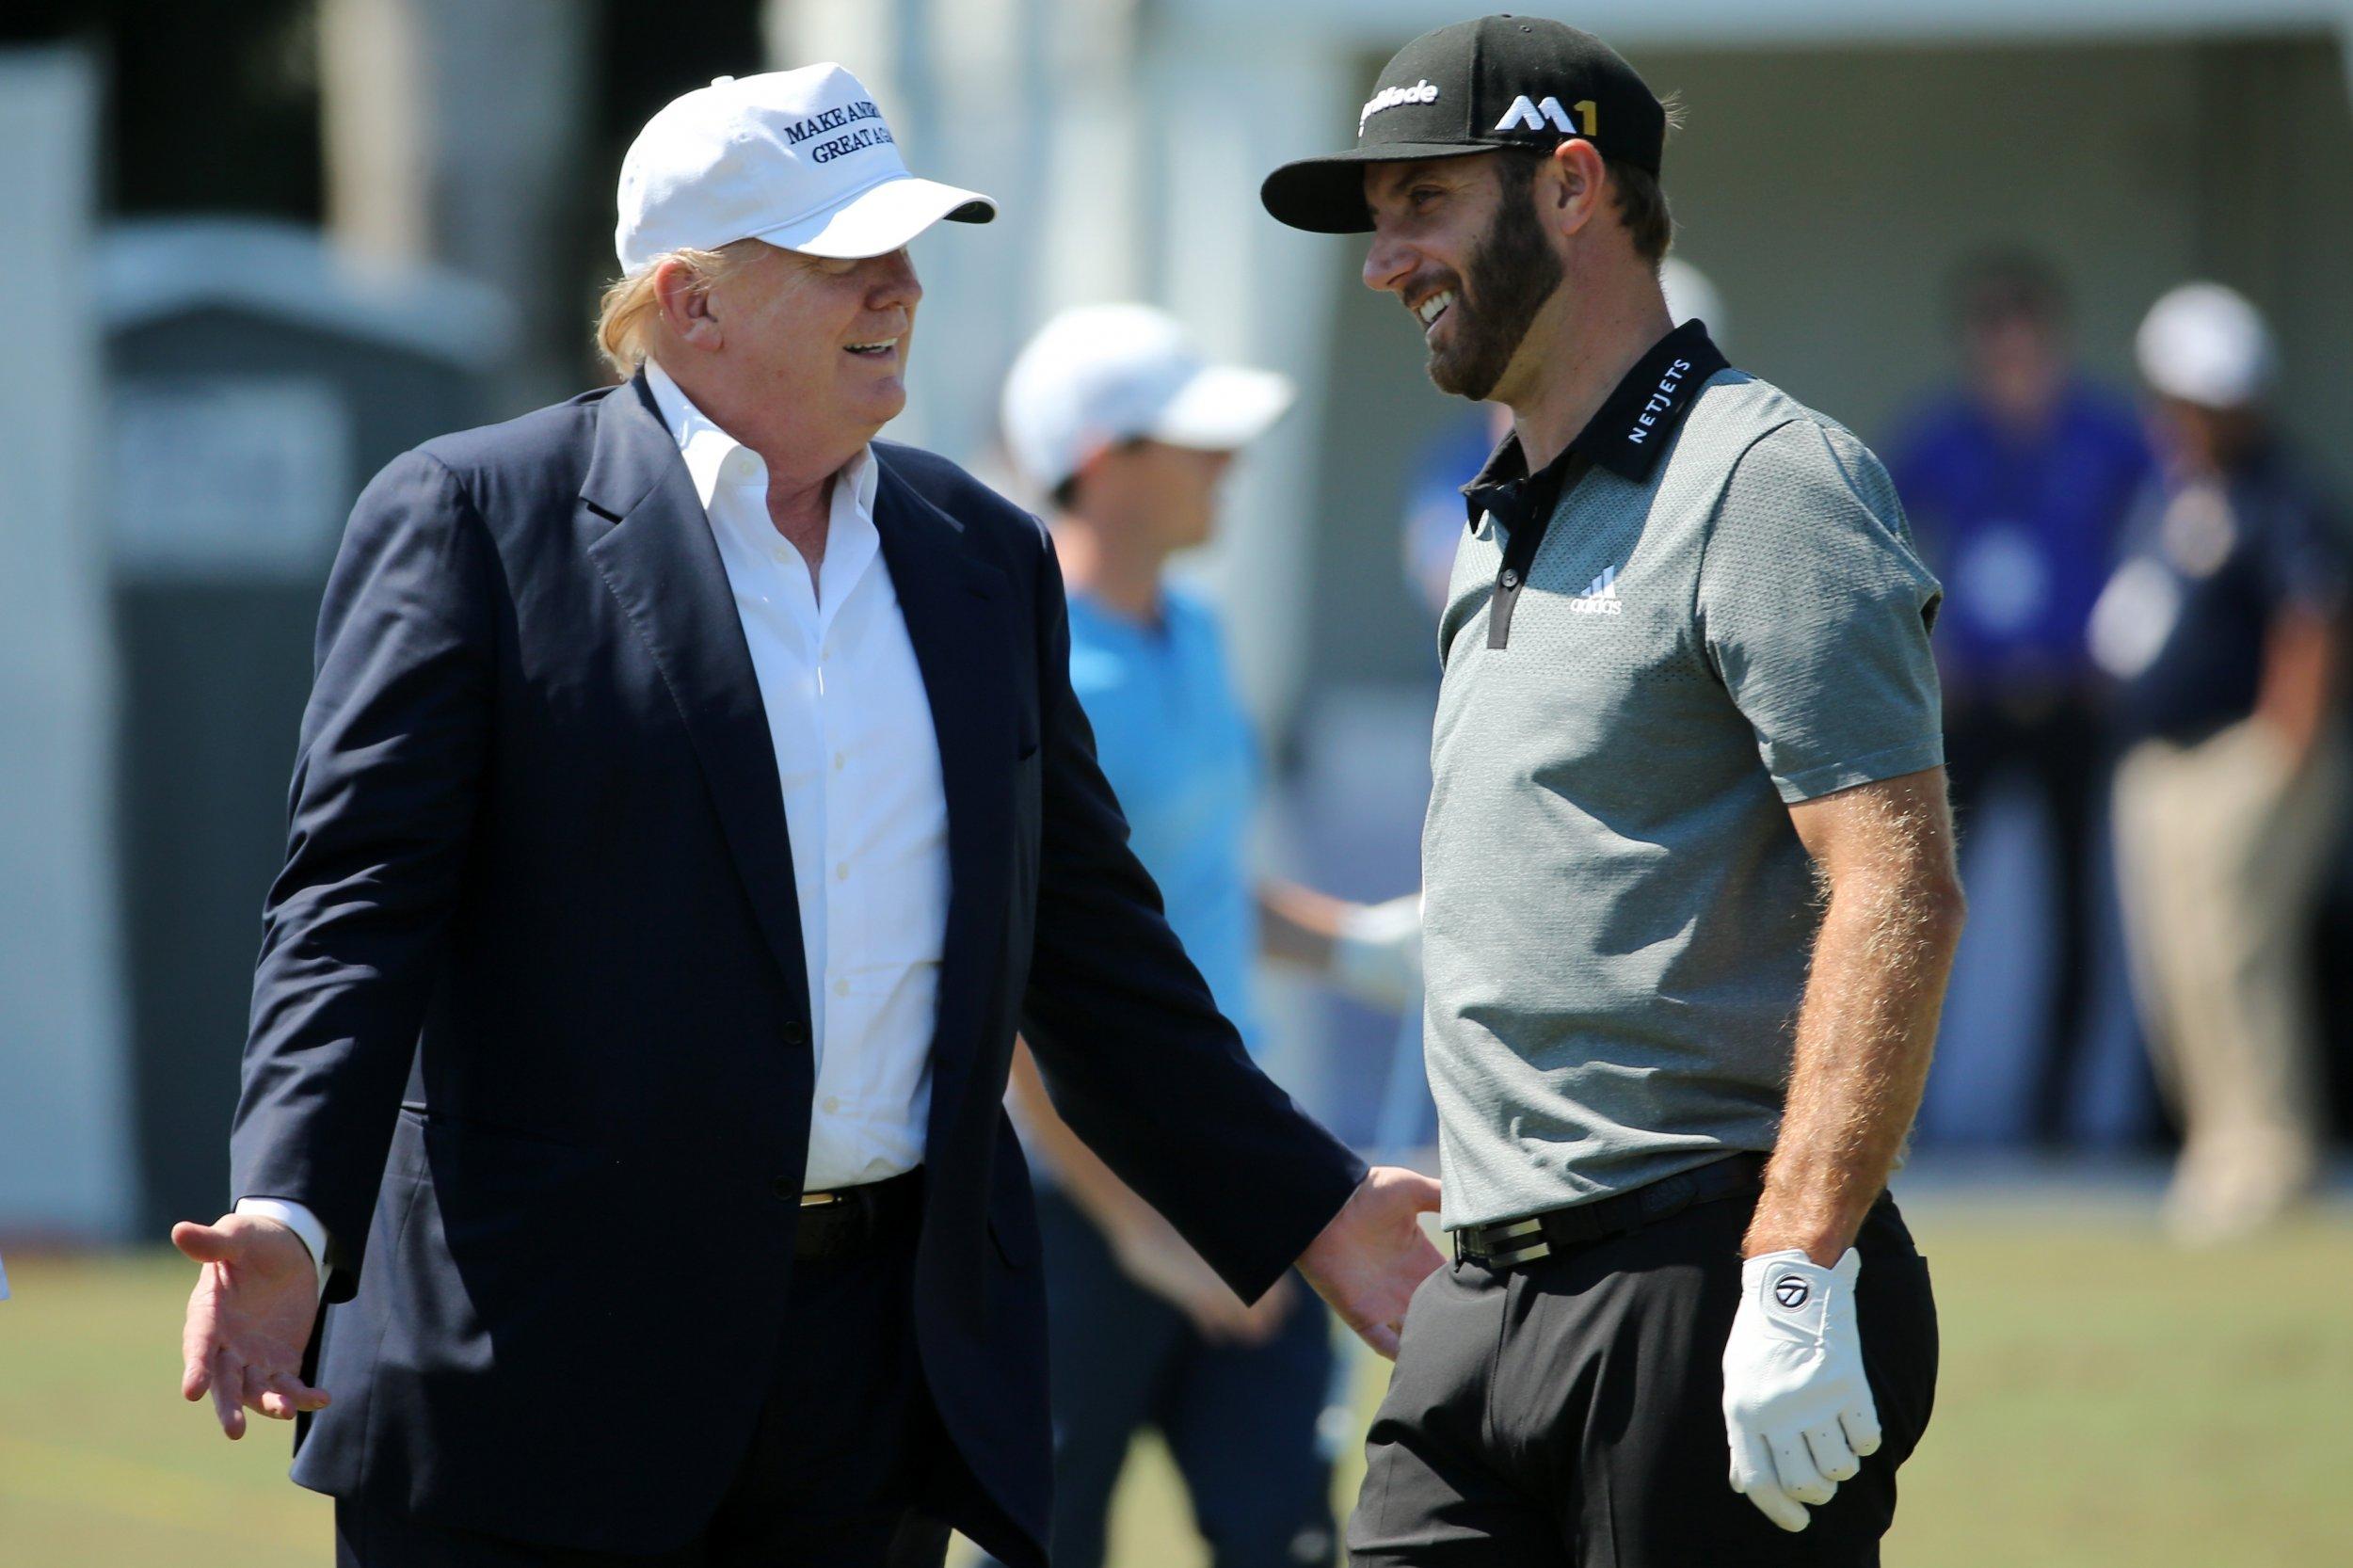 Donald Trump, left, with golfer Dustin Johnson.